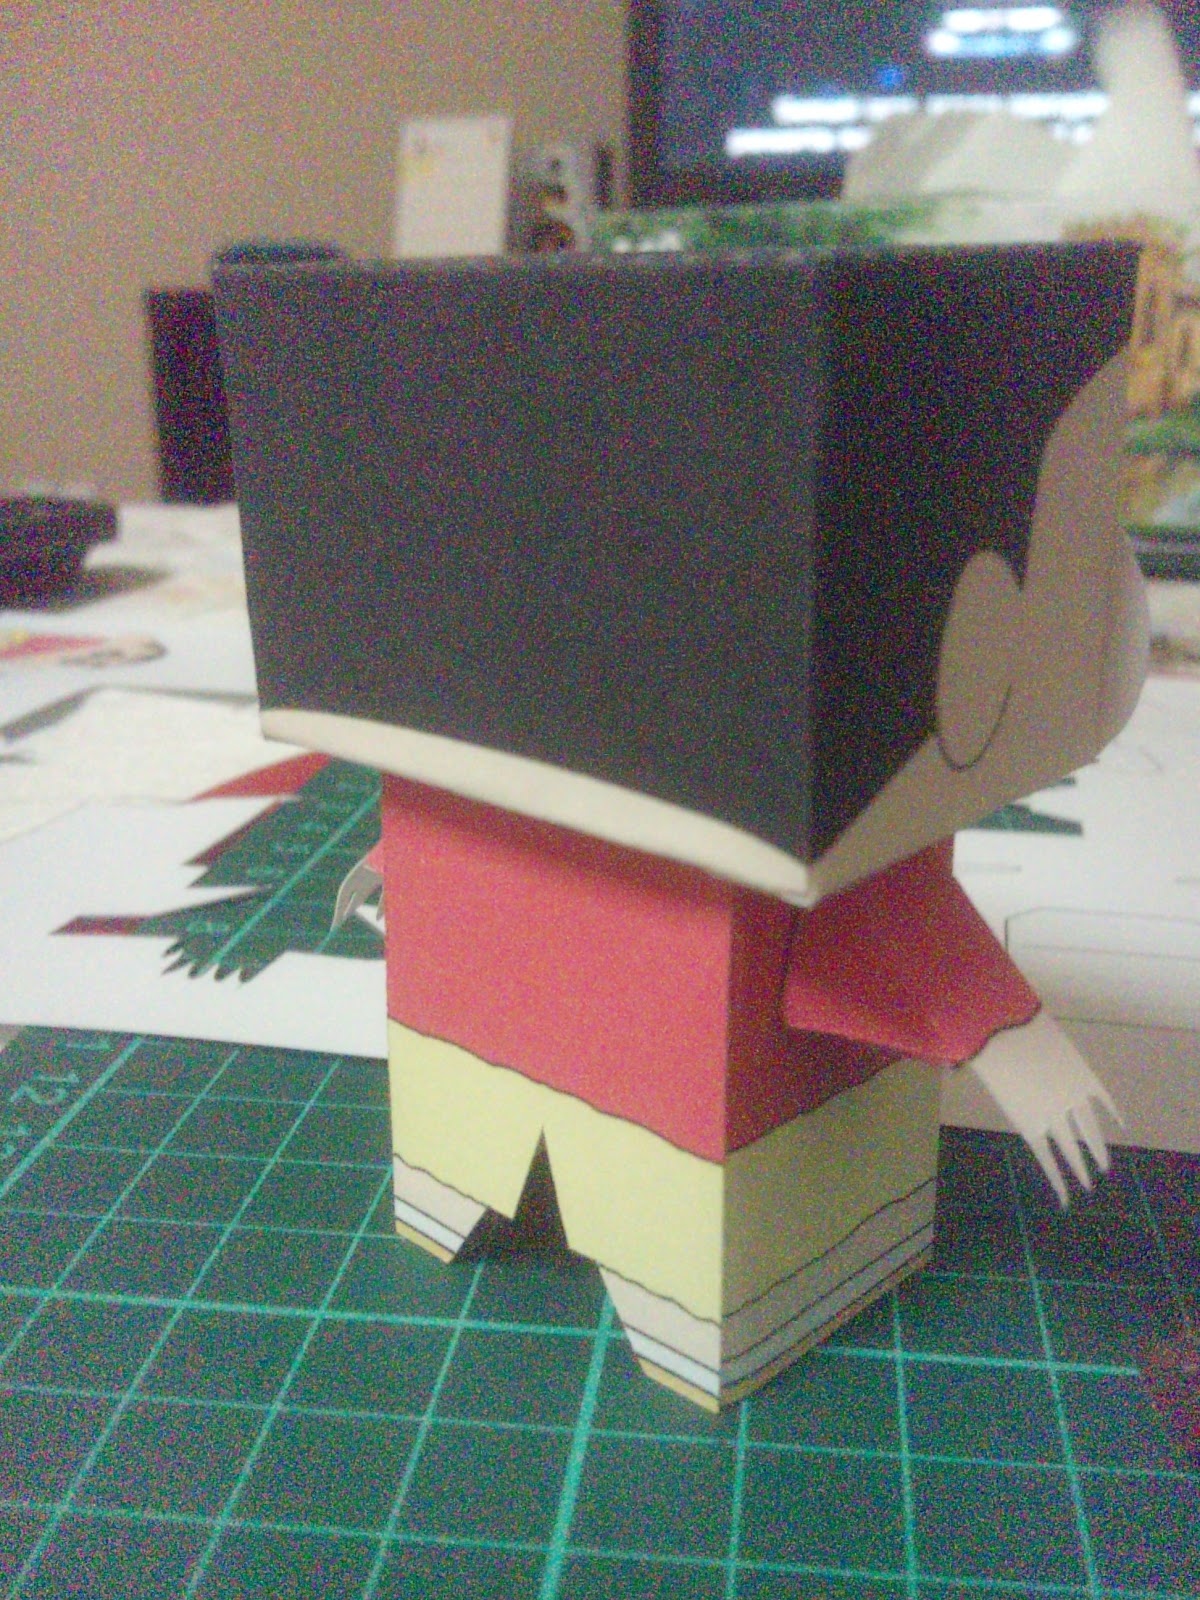 shin chan muneco papel